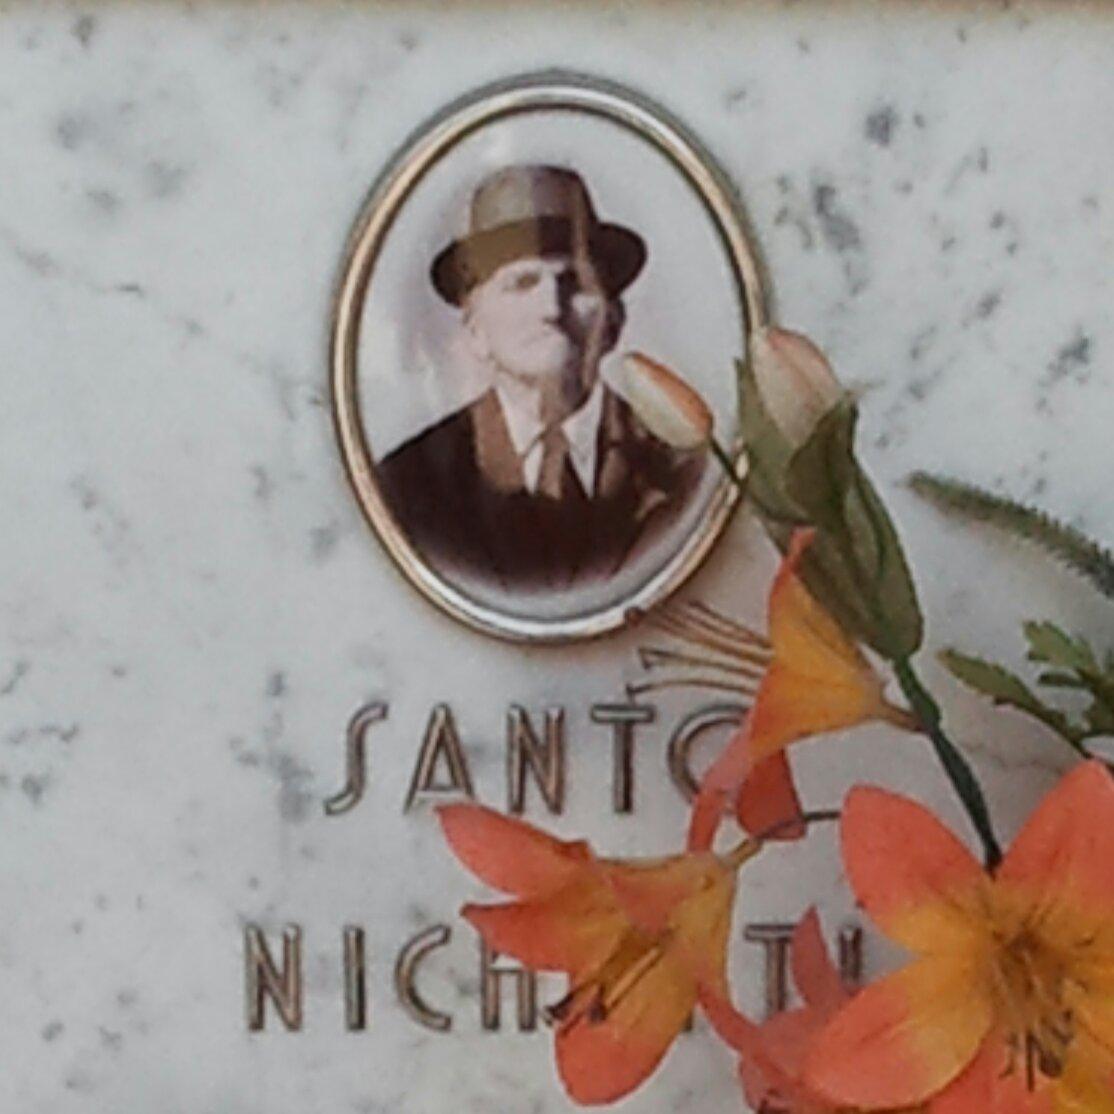 Santo Nichetti